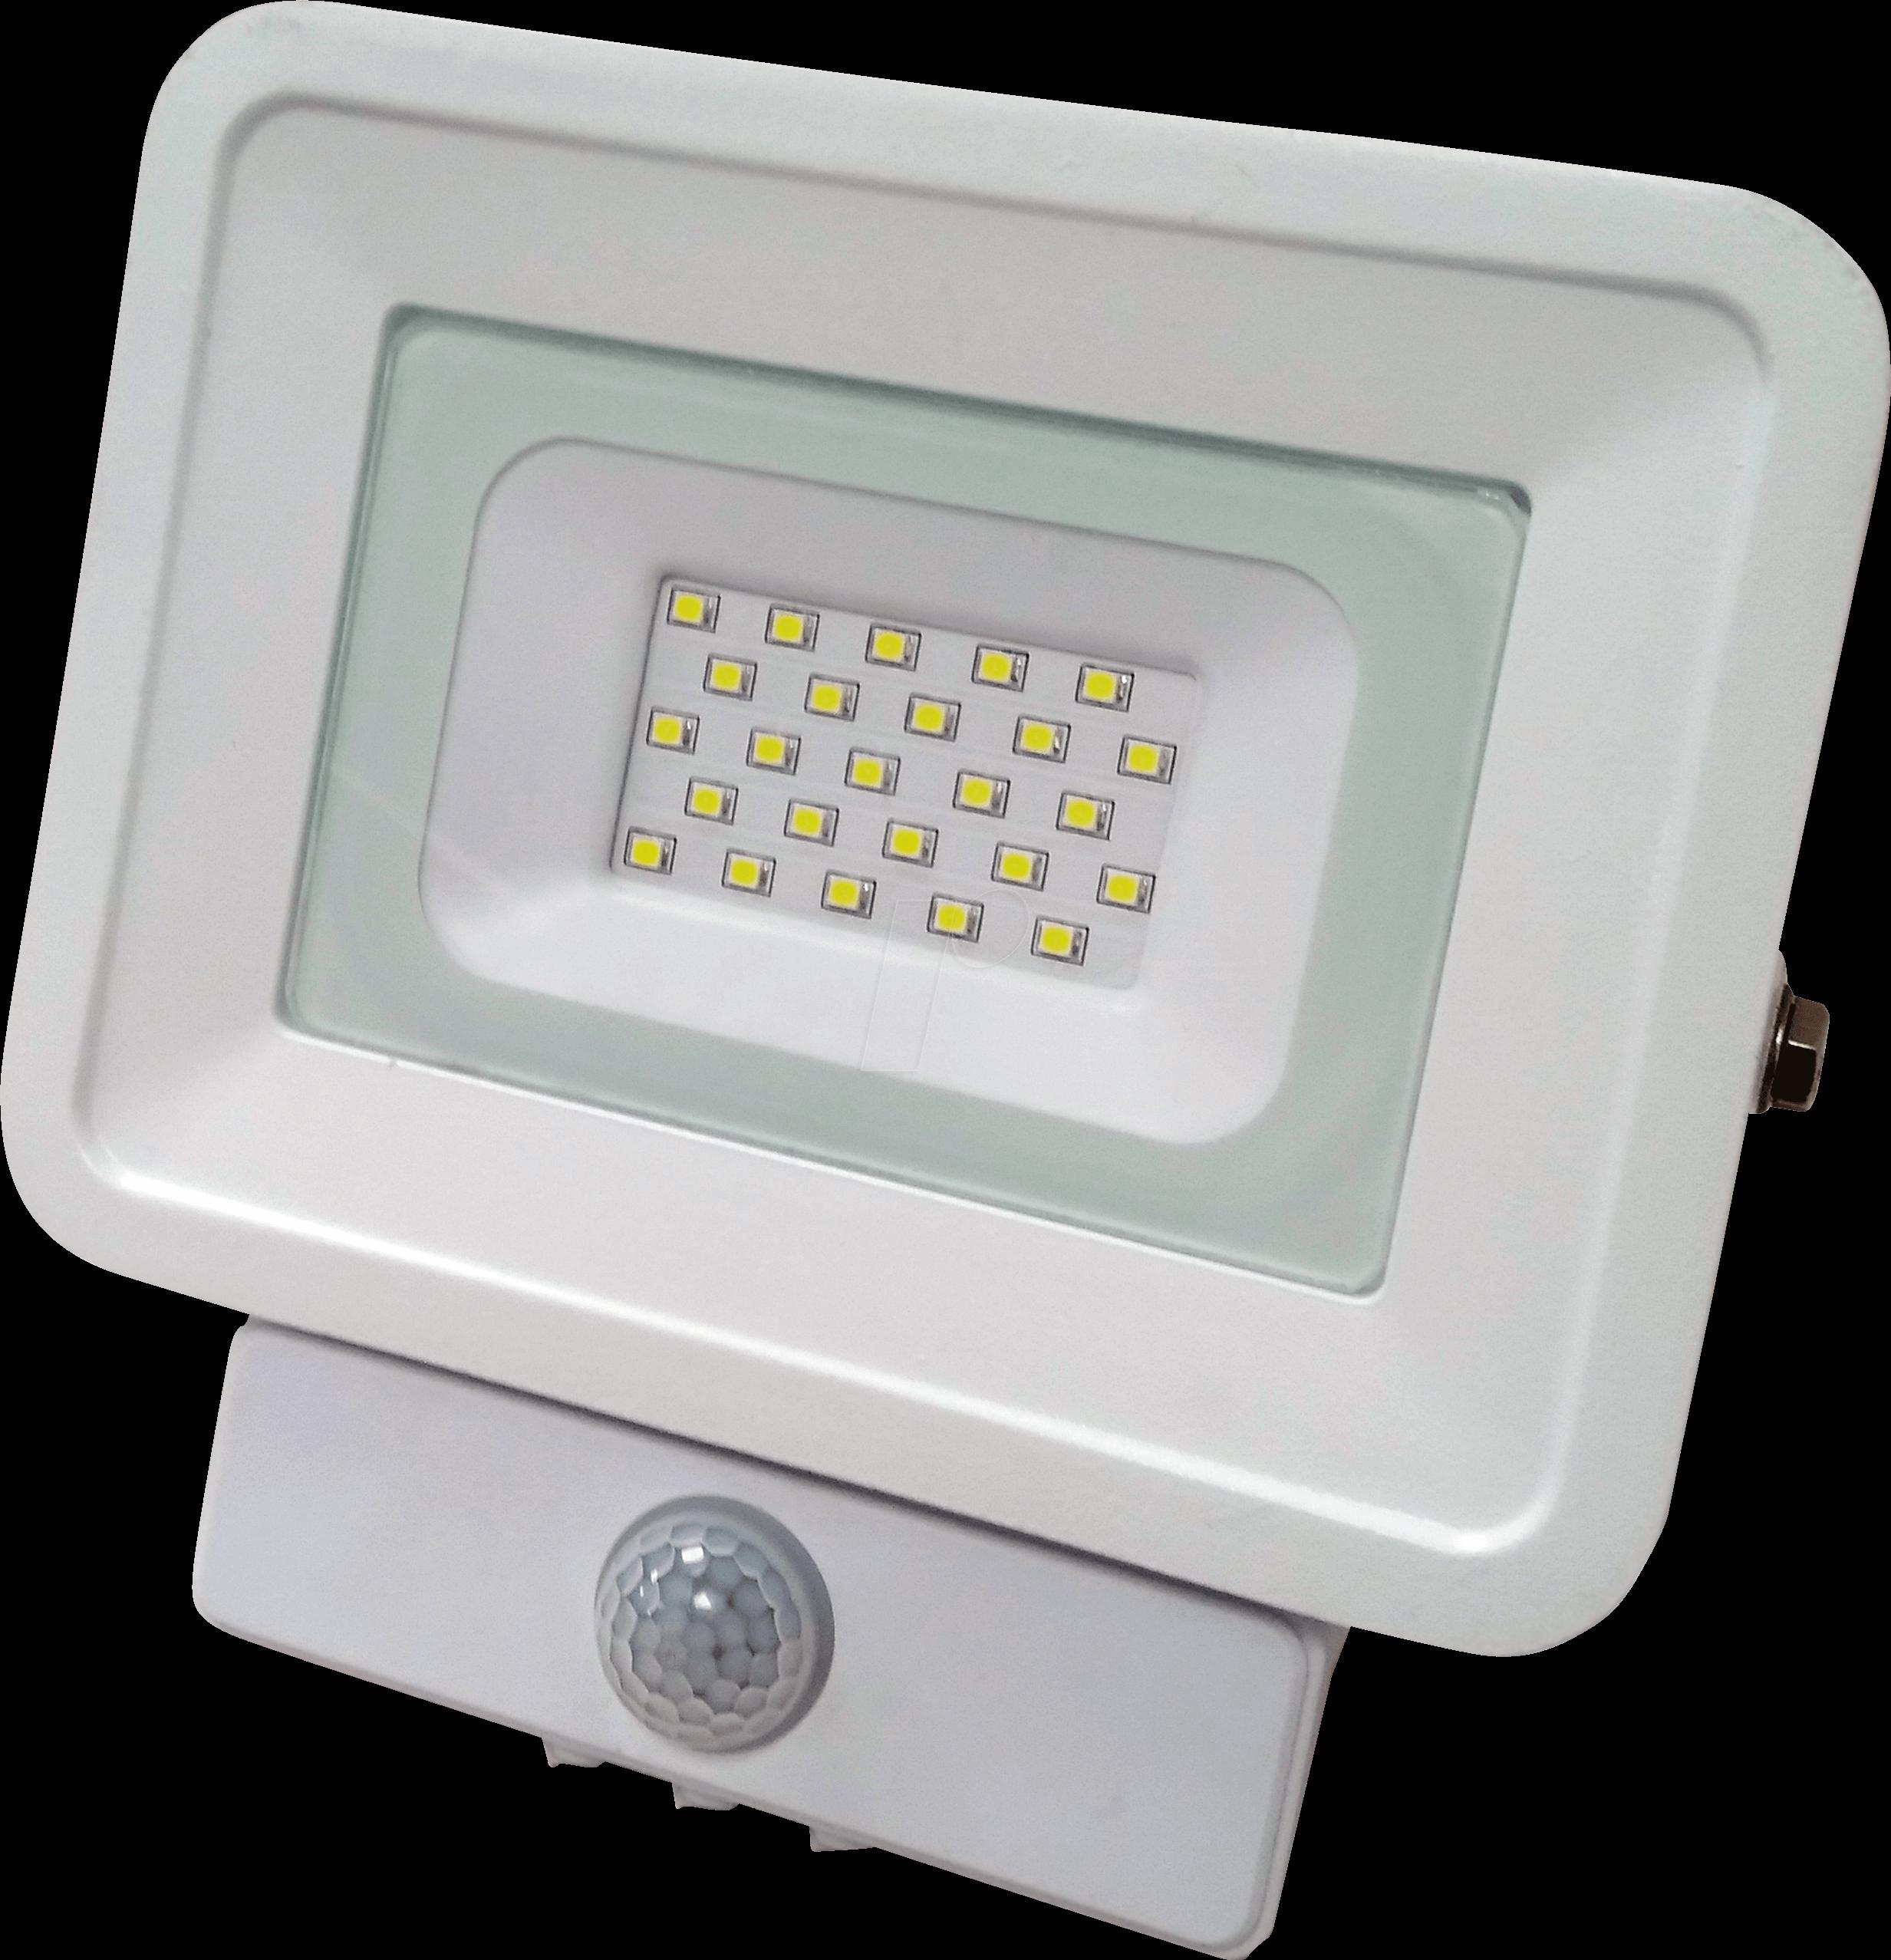 OPT FL5842 - LED-Fluter, Bewegungsmelder, 10 W, 850 lm, 4500 K, IP65